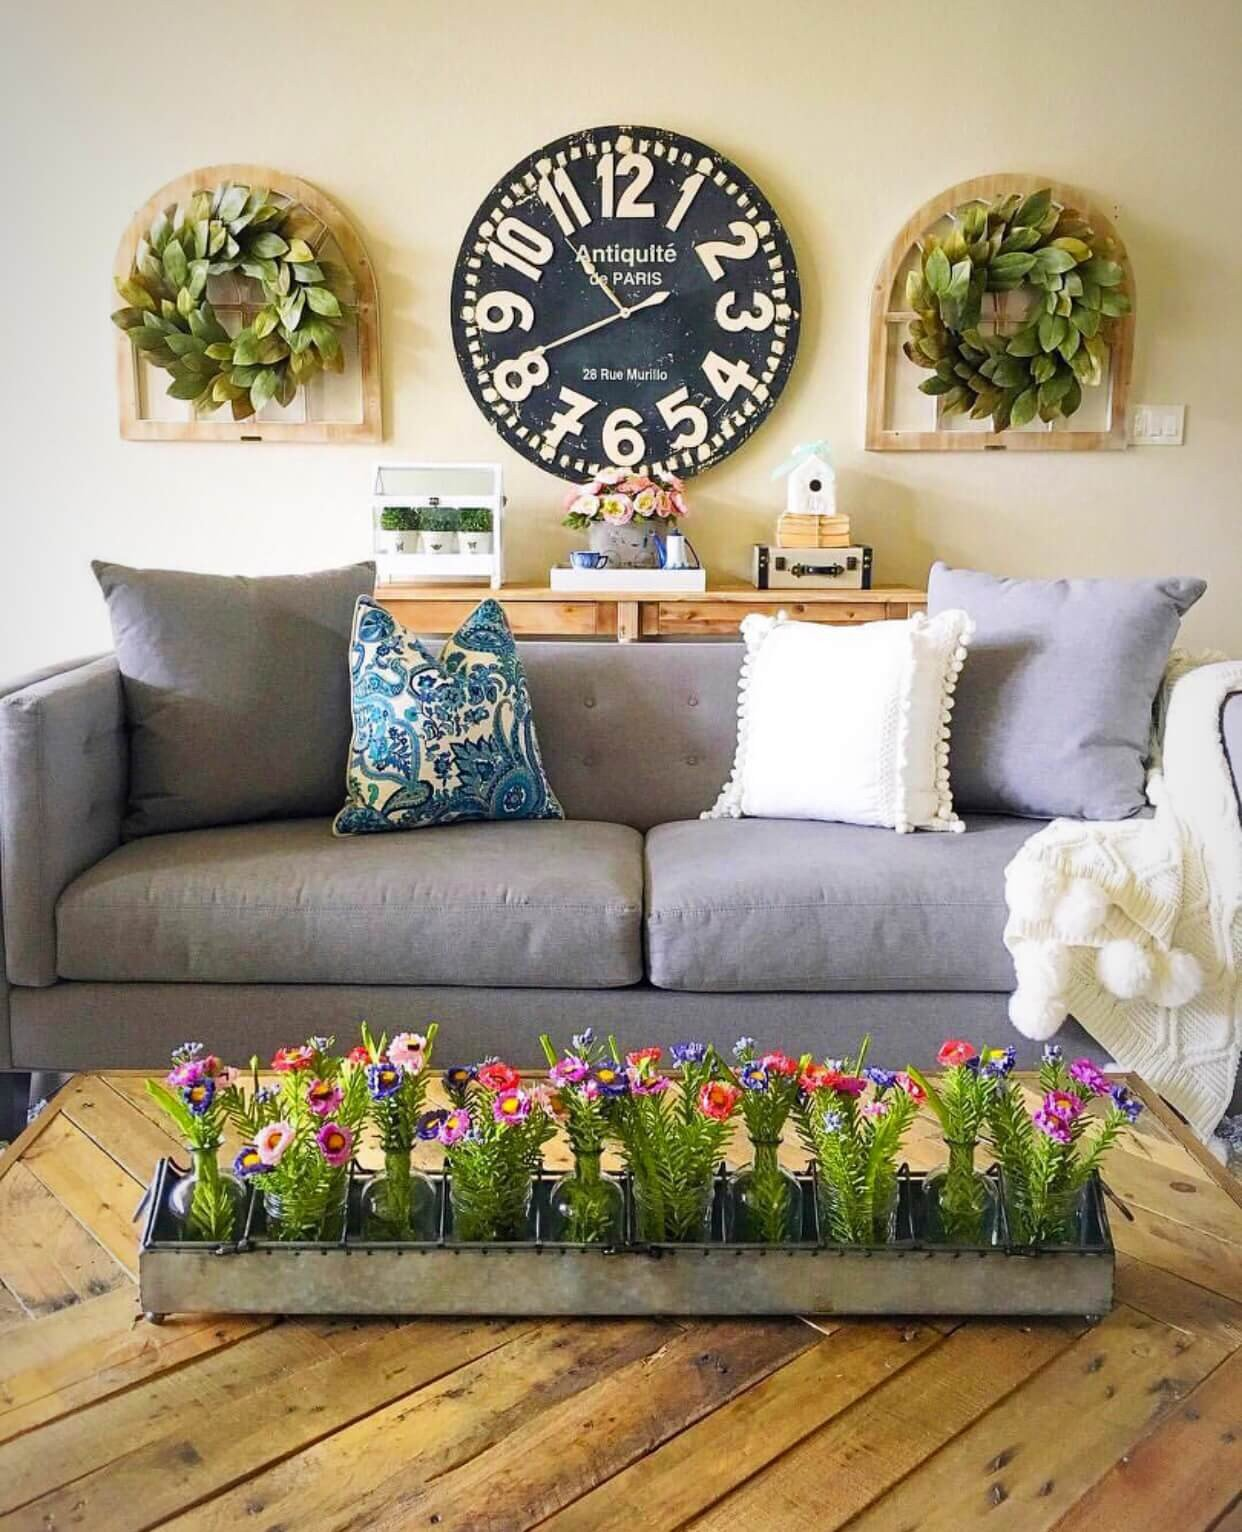 Living Room Wall Decorating Ideas Elegant 33 Best Rustic Living Room Wall Decor Ideas and Designs for 2019